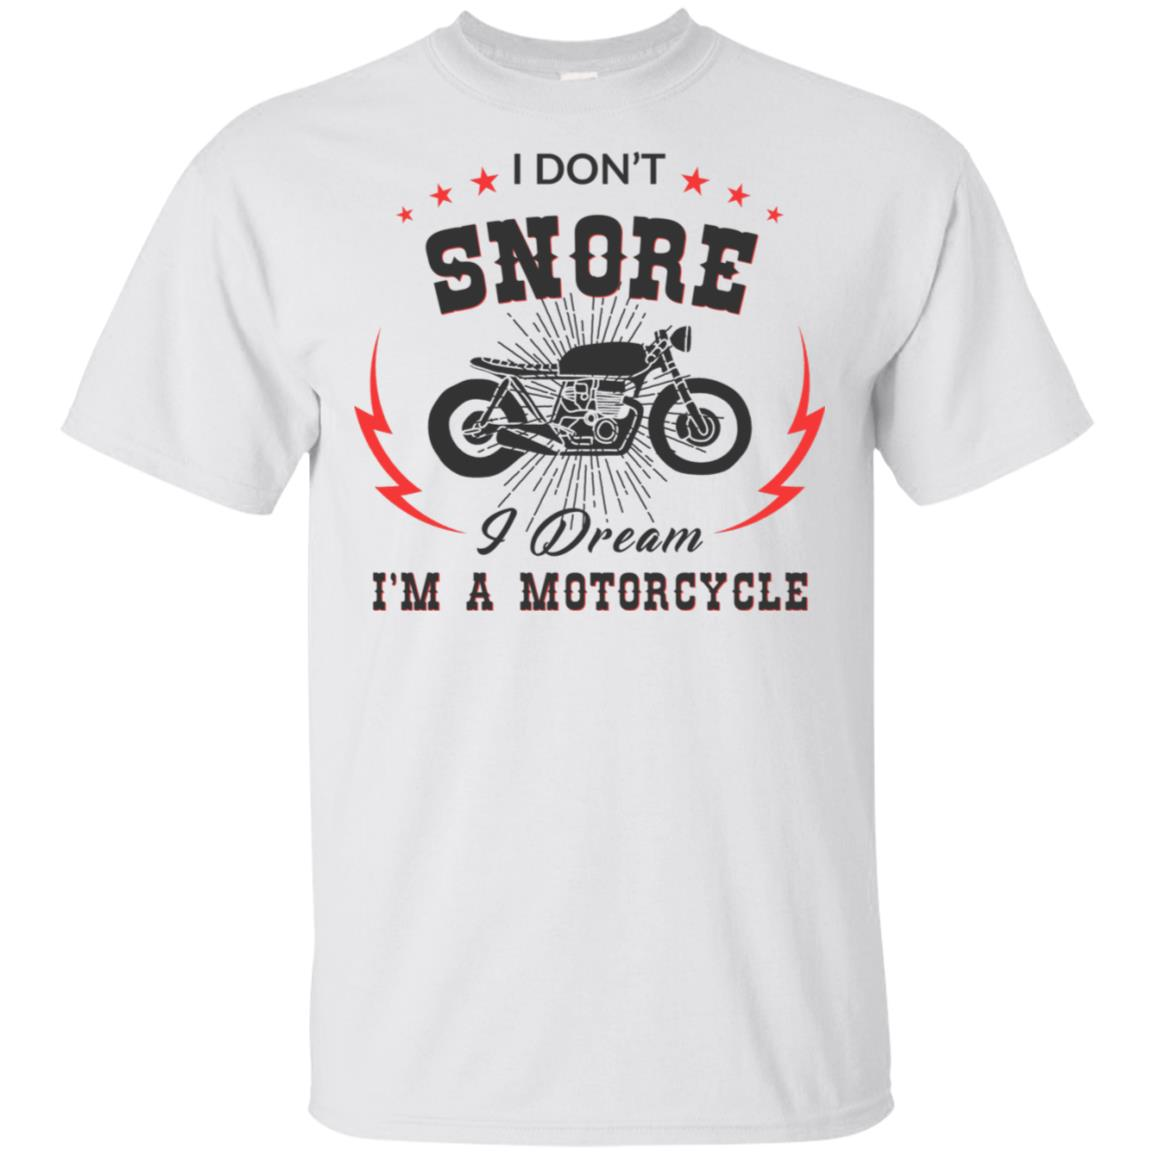 I Don't Snore I Dream I'm A Motorcycle Biker -1 Unisex Short Sleeve